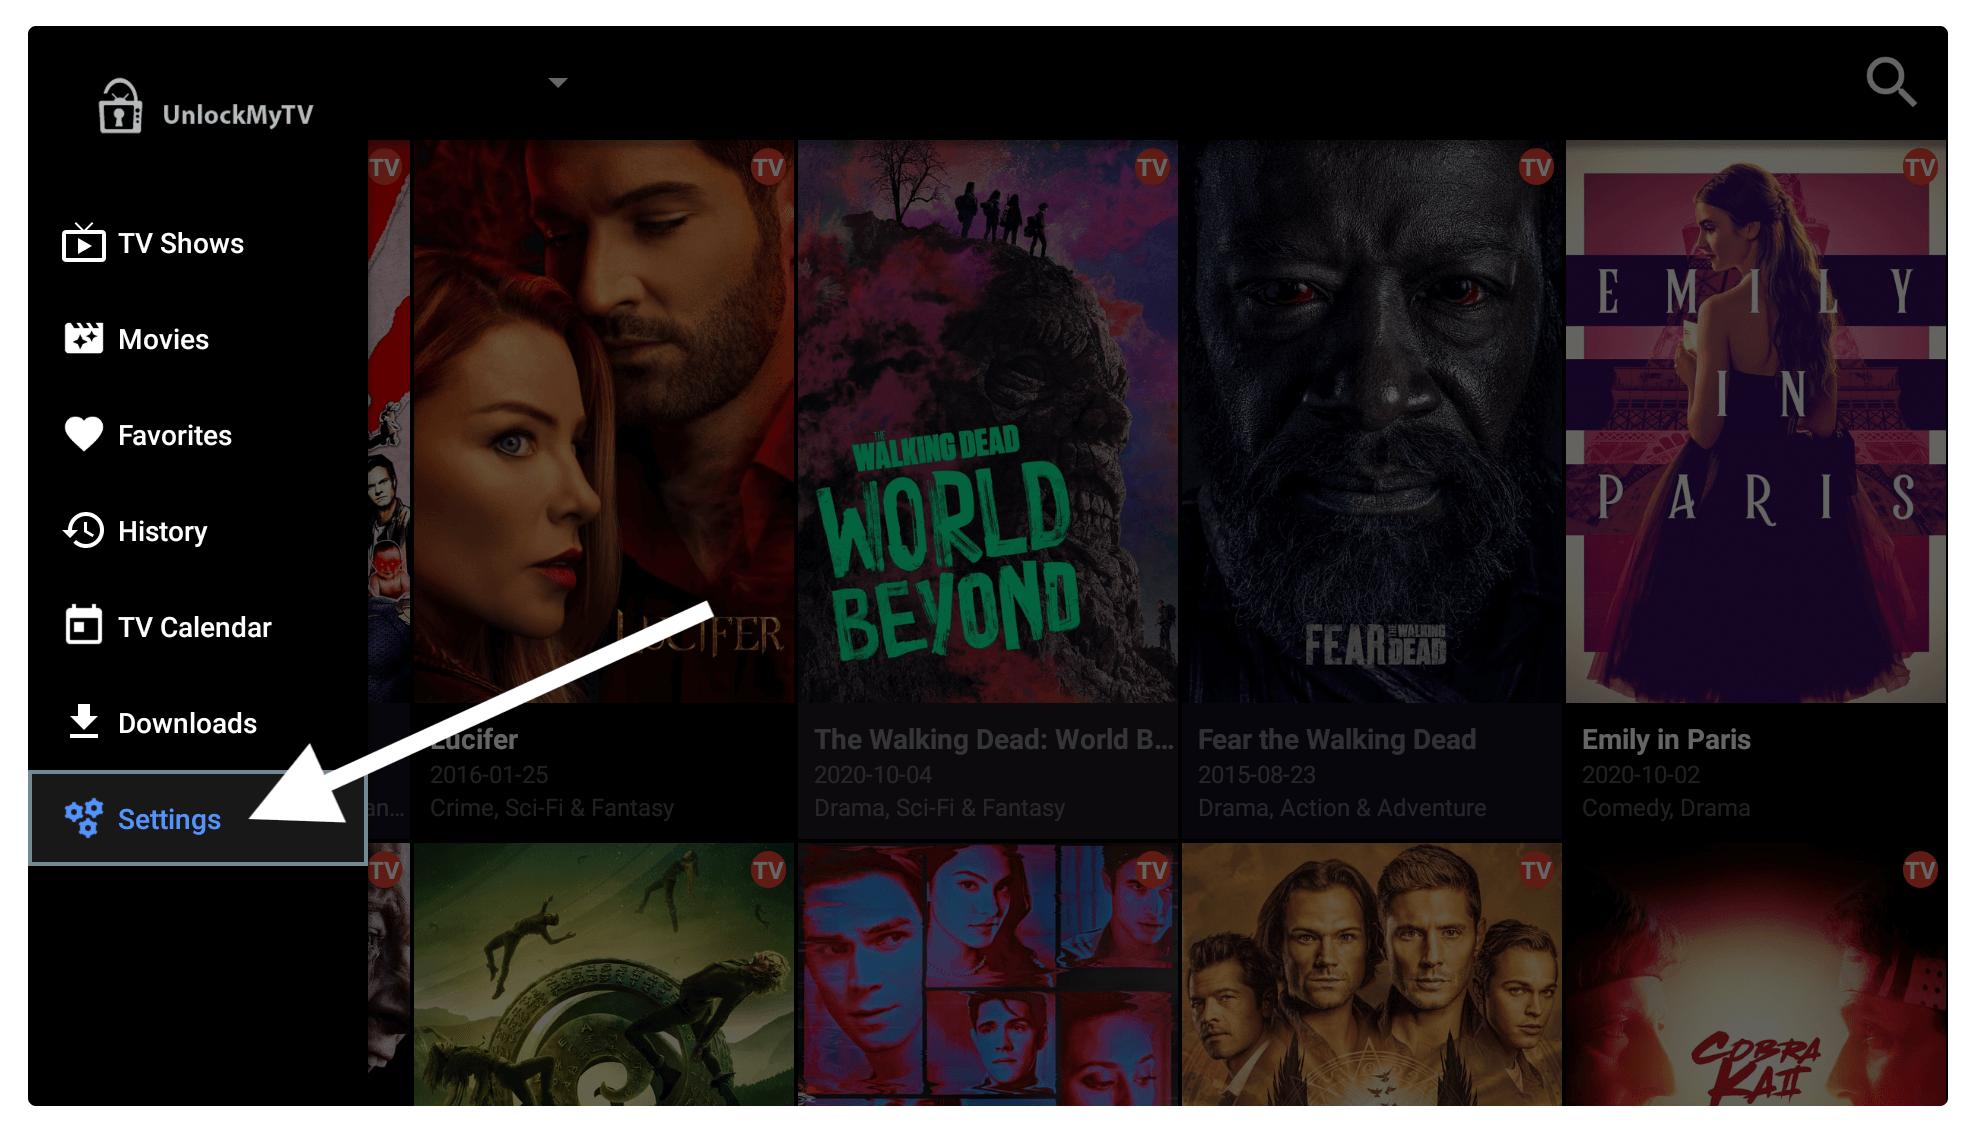 Change-Media-Player-in-UnlockMyTV-App